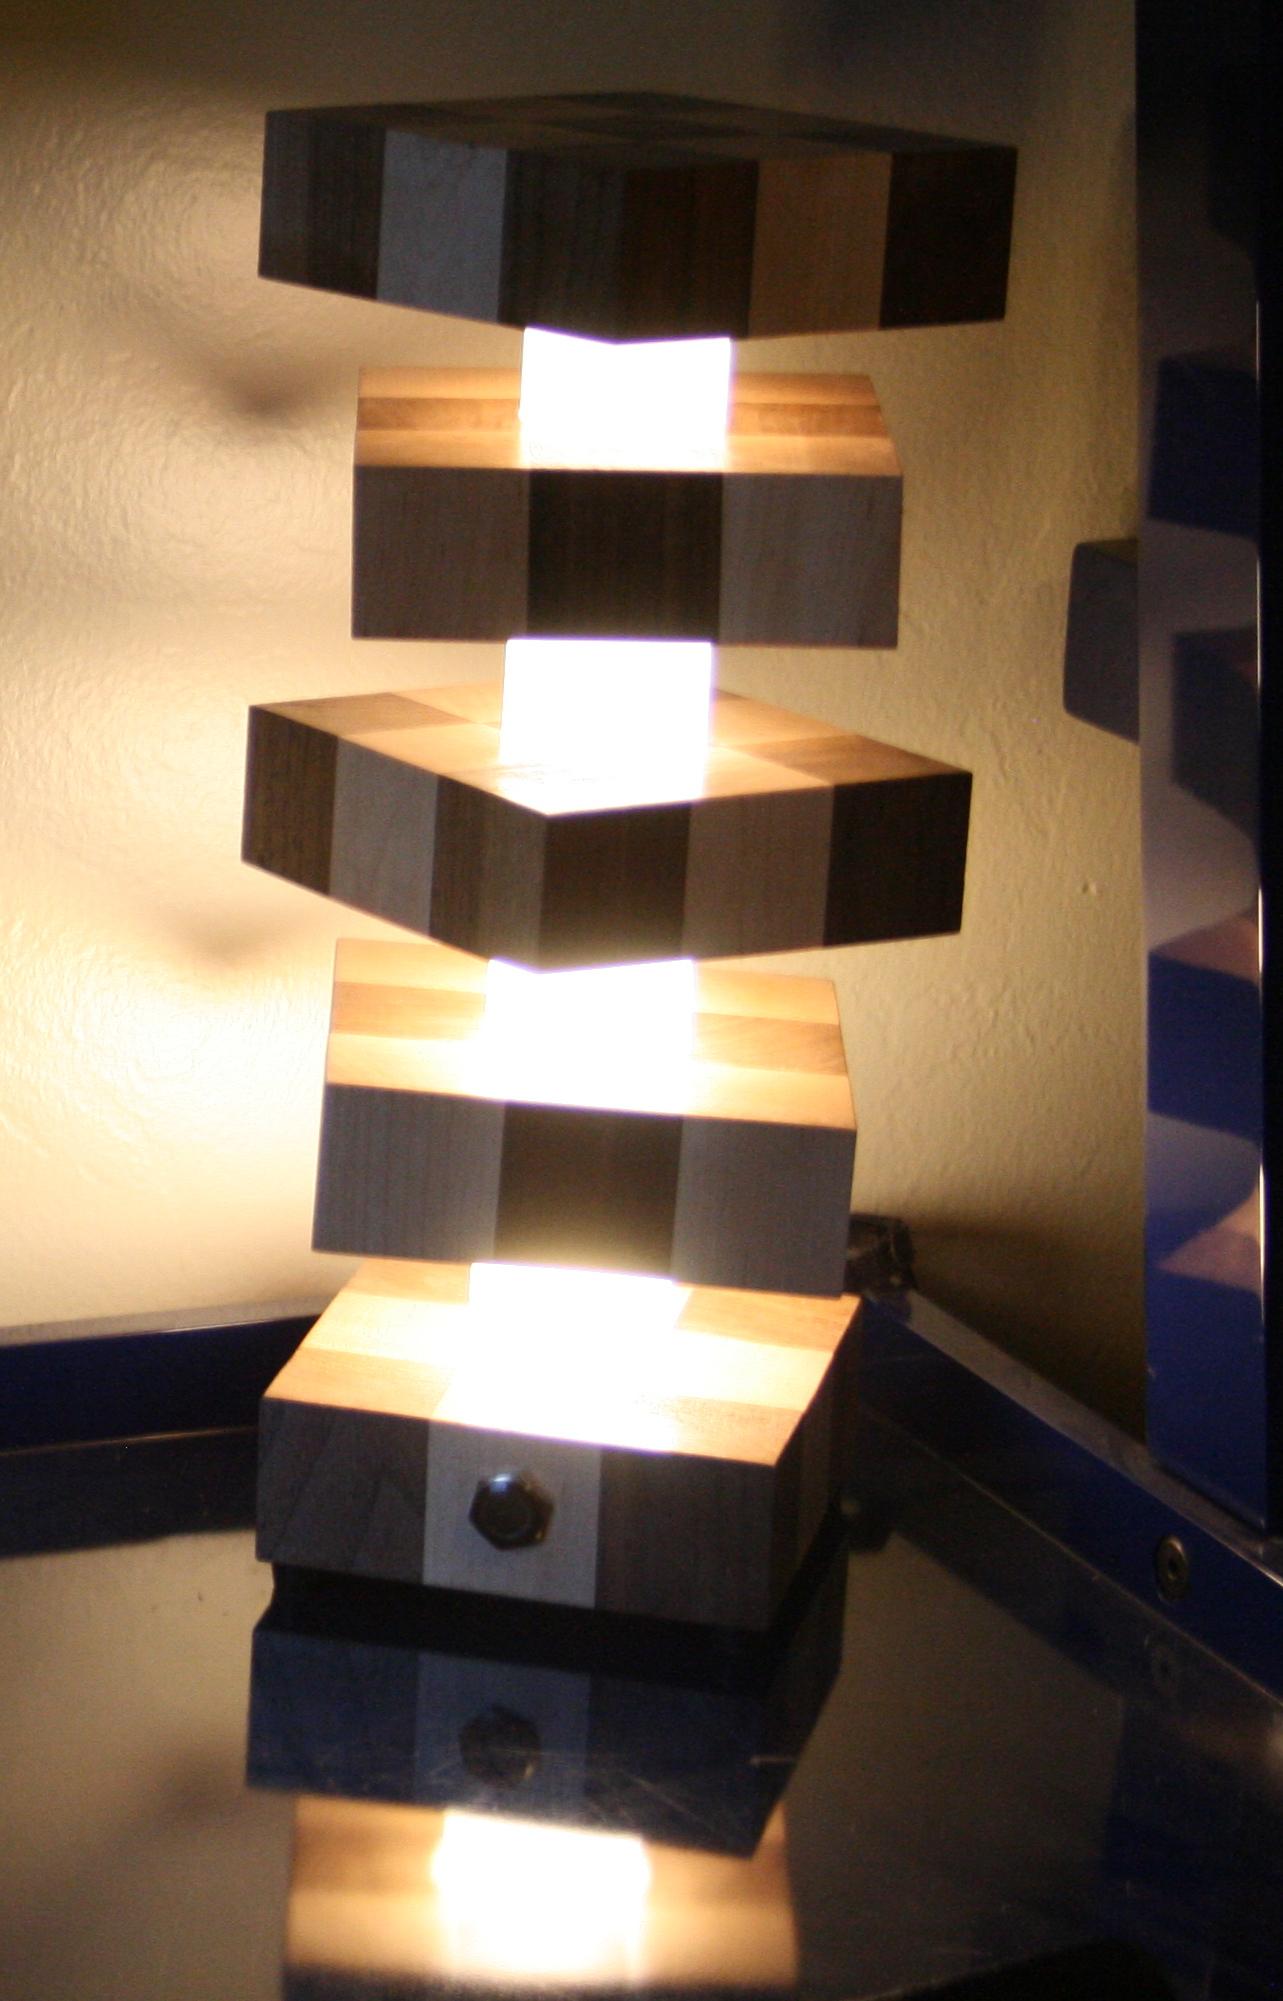 twisty-lamp-tower-on-at-night.JPG